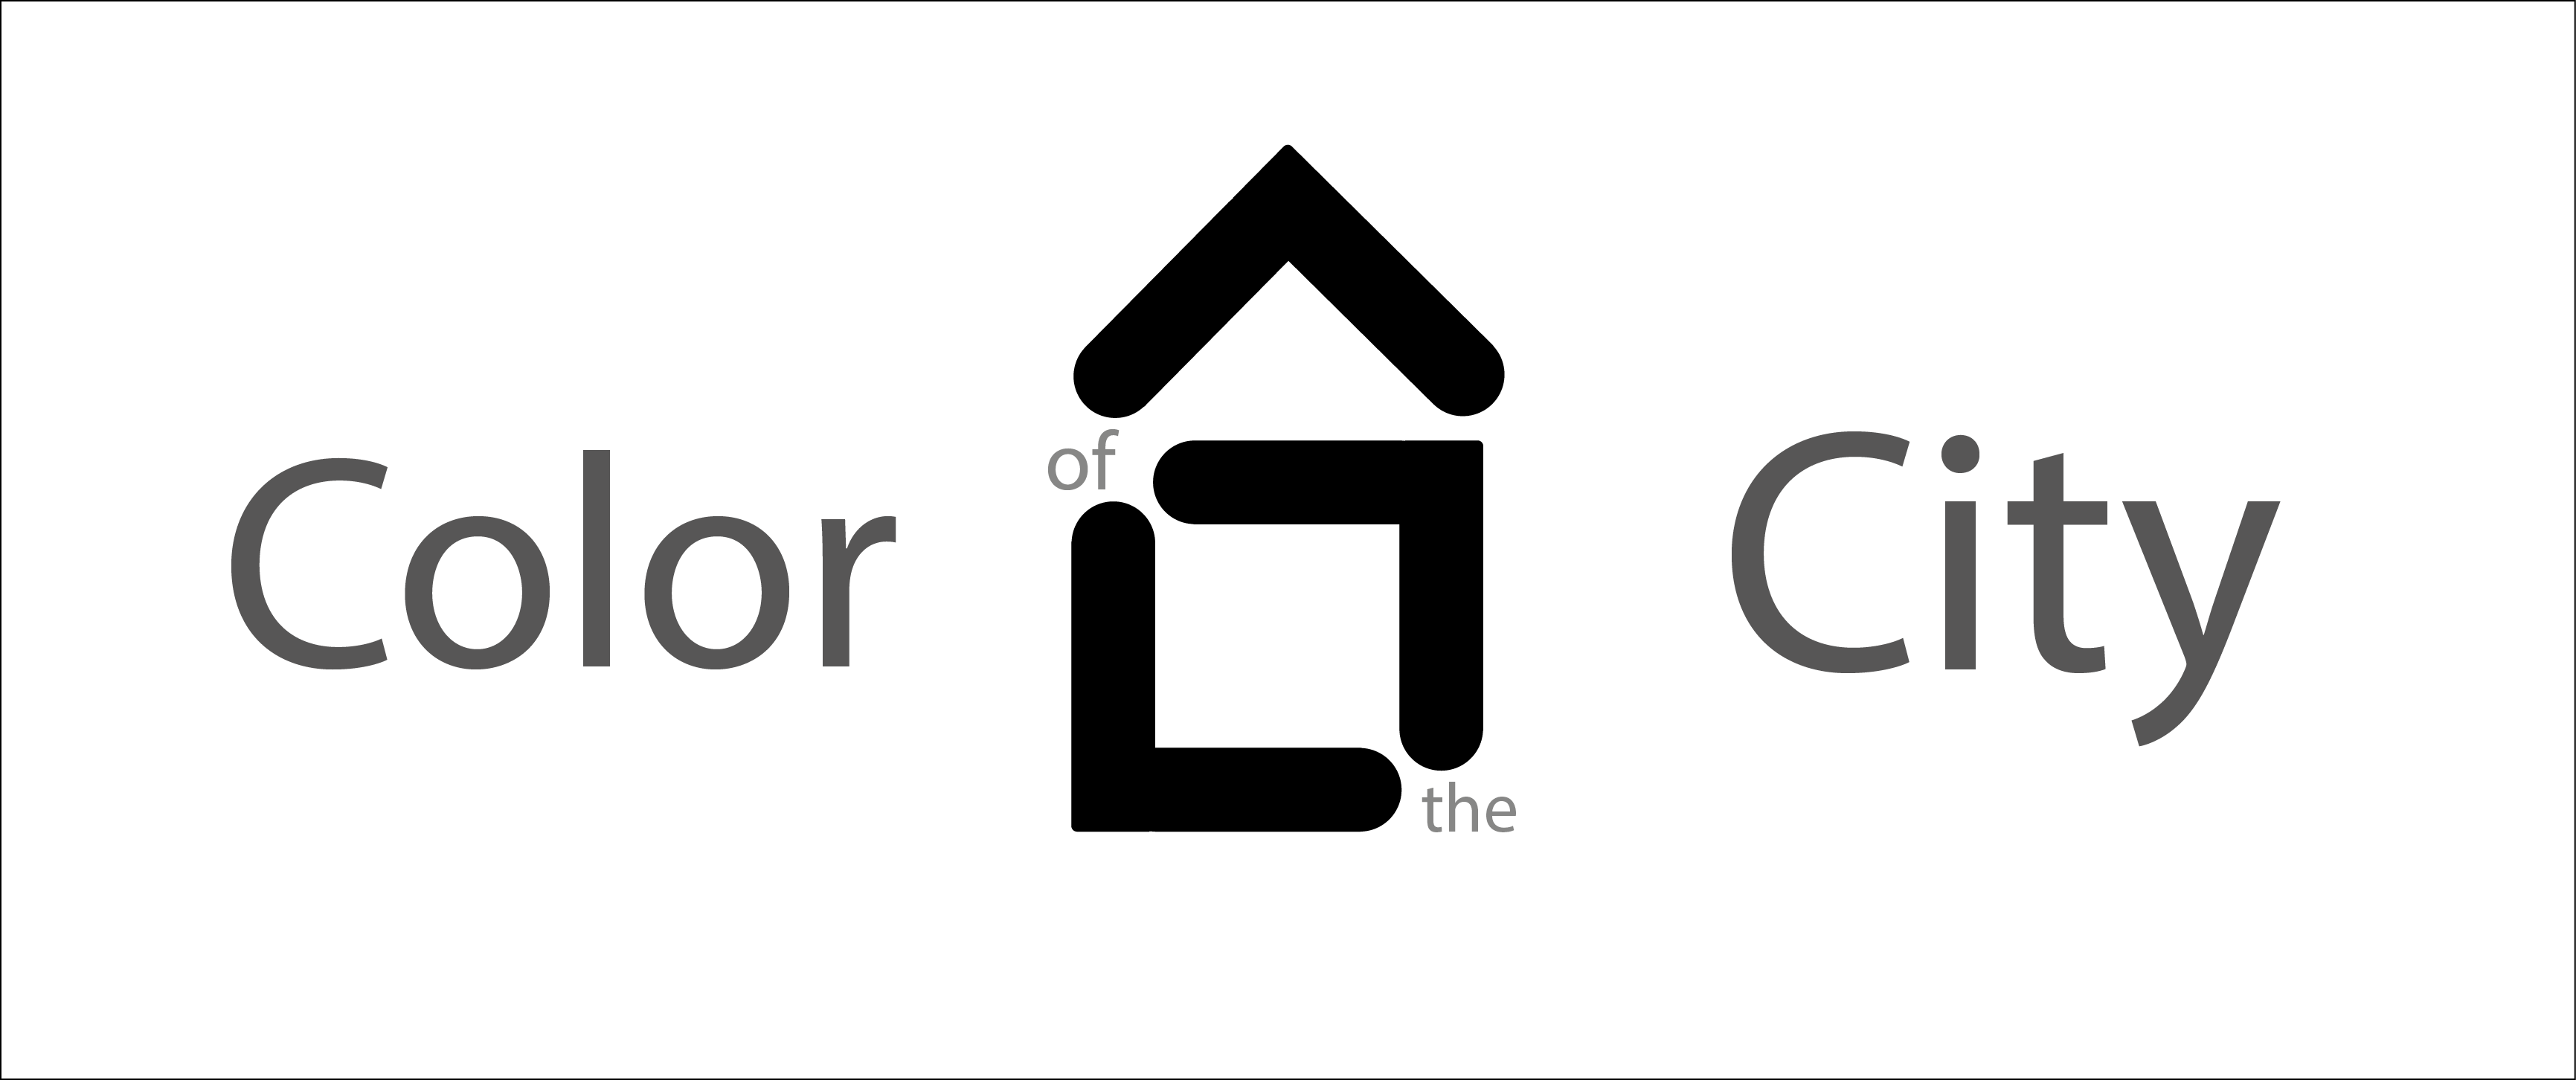 Необходим логотип для сети хостелов фото f_22651a72118da294.png